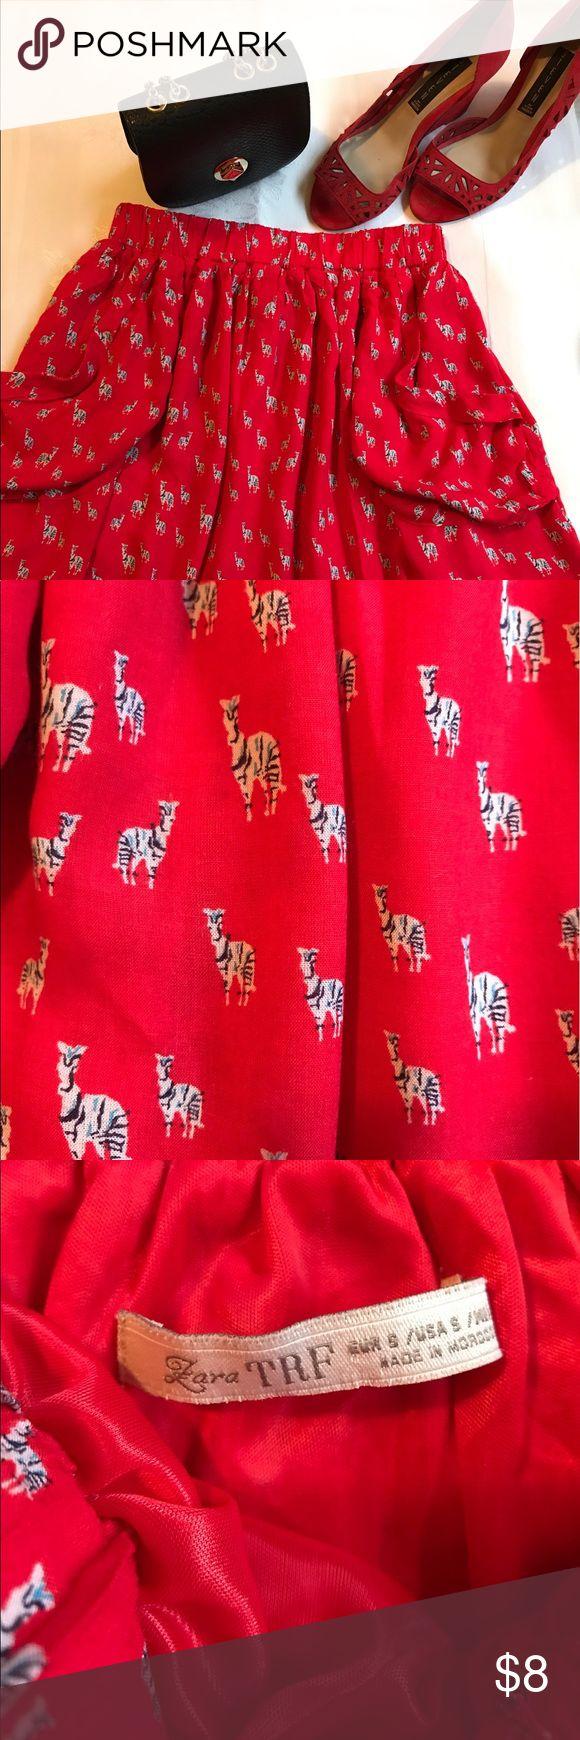 Zara skirt, size s, %100 viscose Excellent condition. So comfortable. Zara Skirts Midi